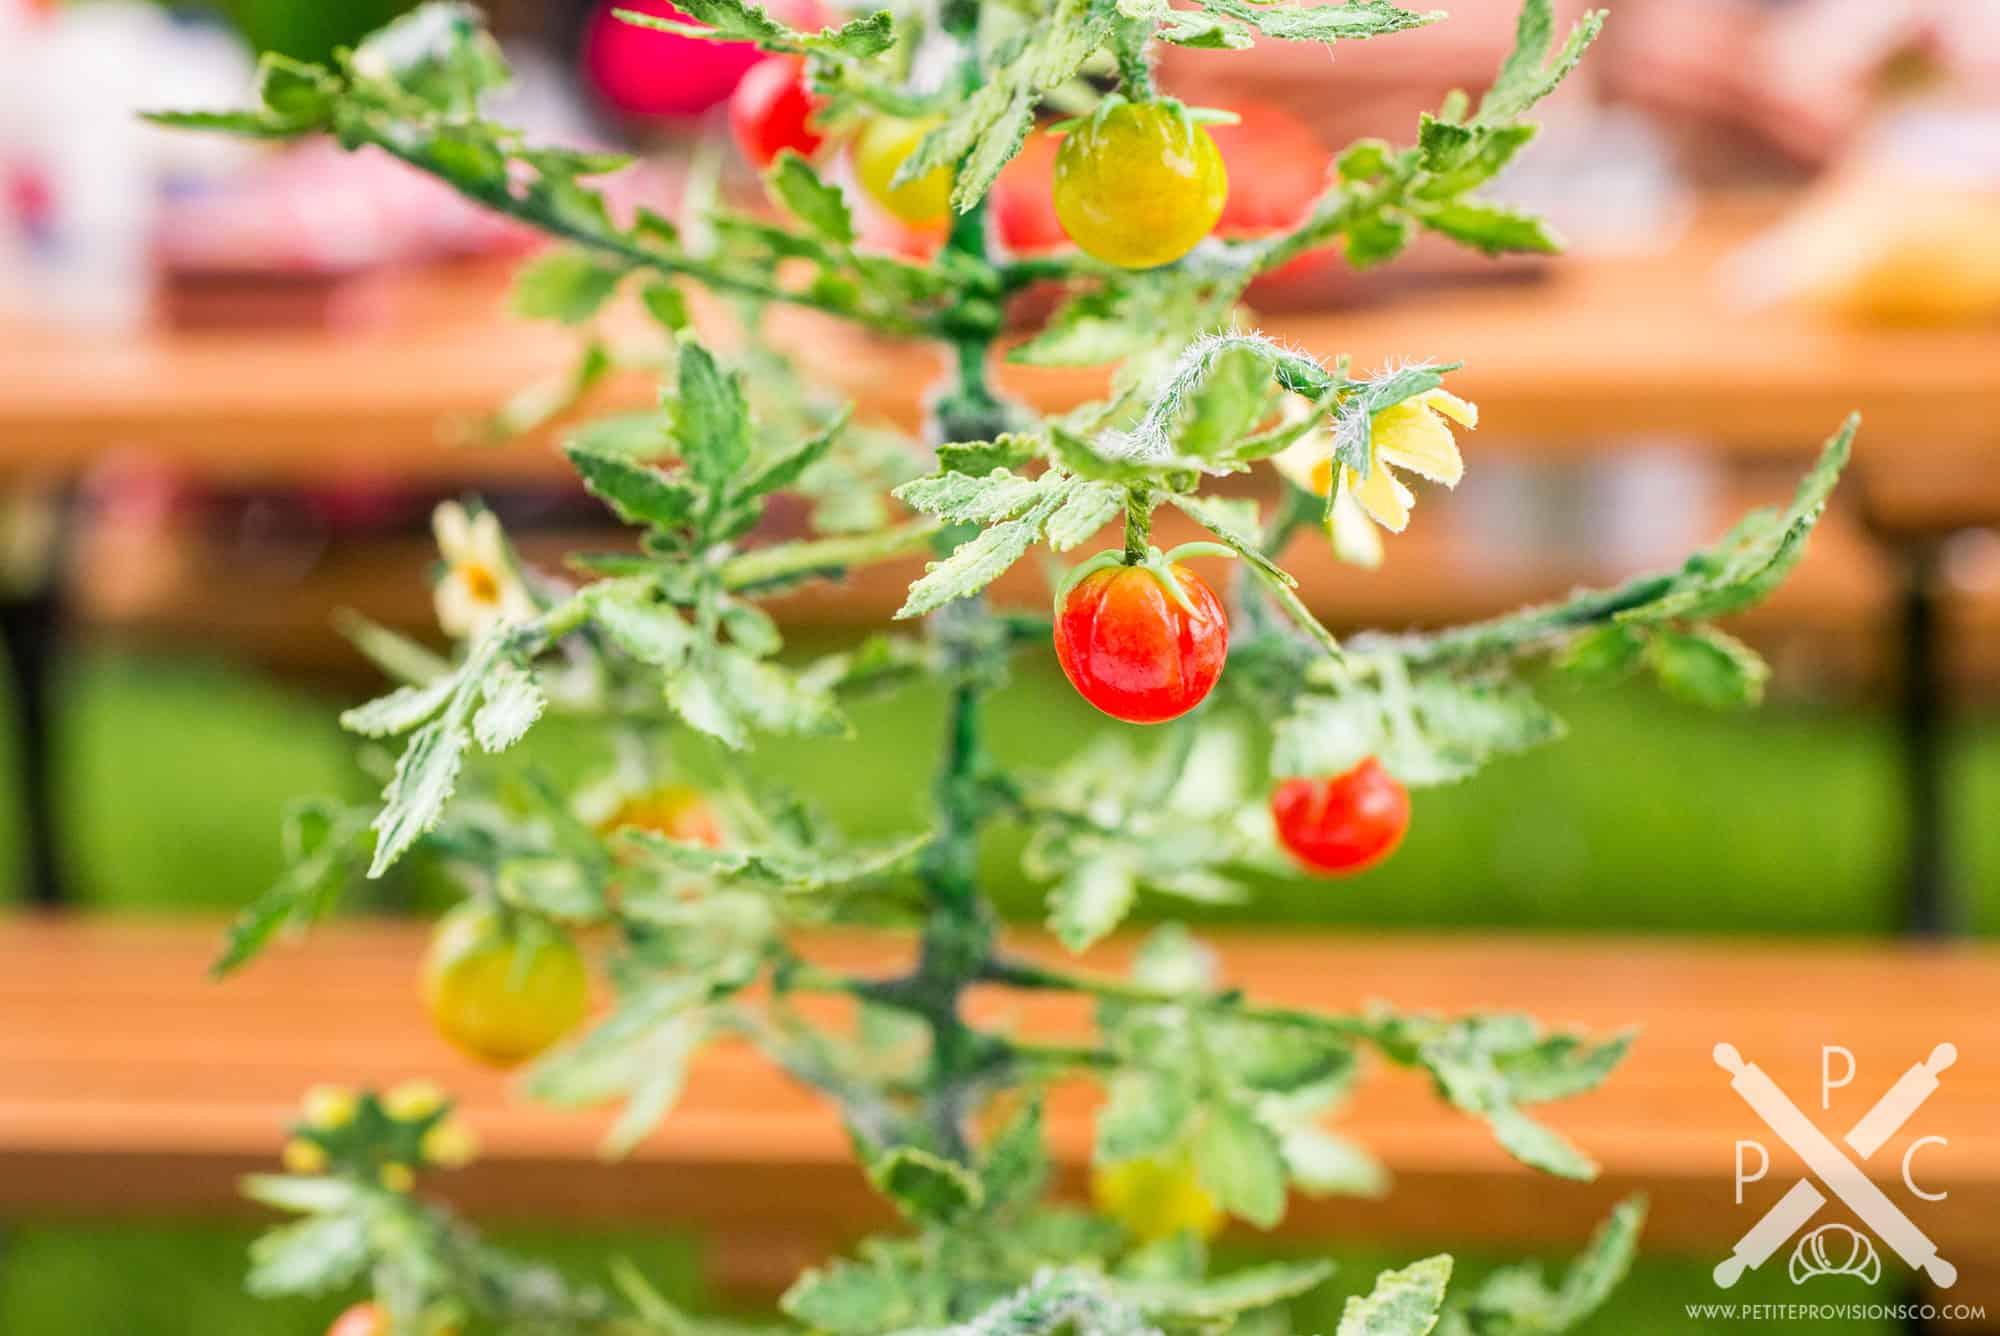 Sculpted miniature tomato plant